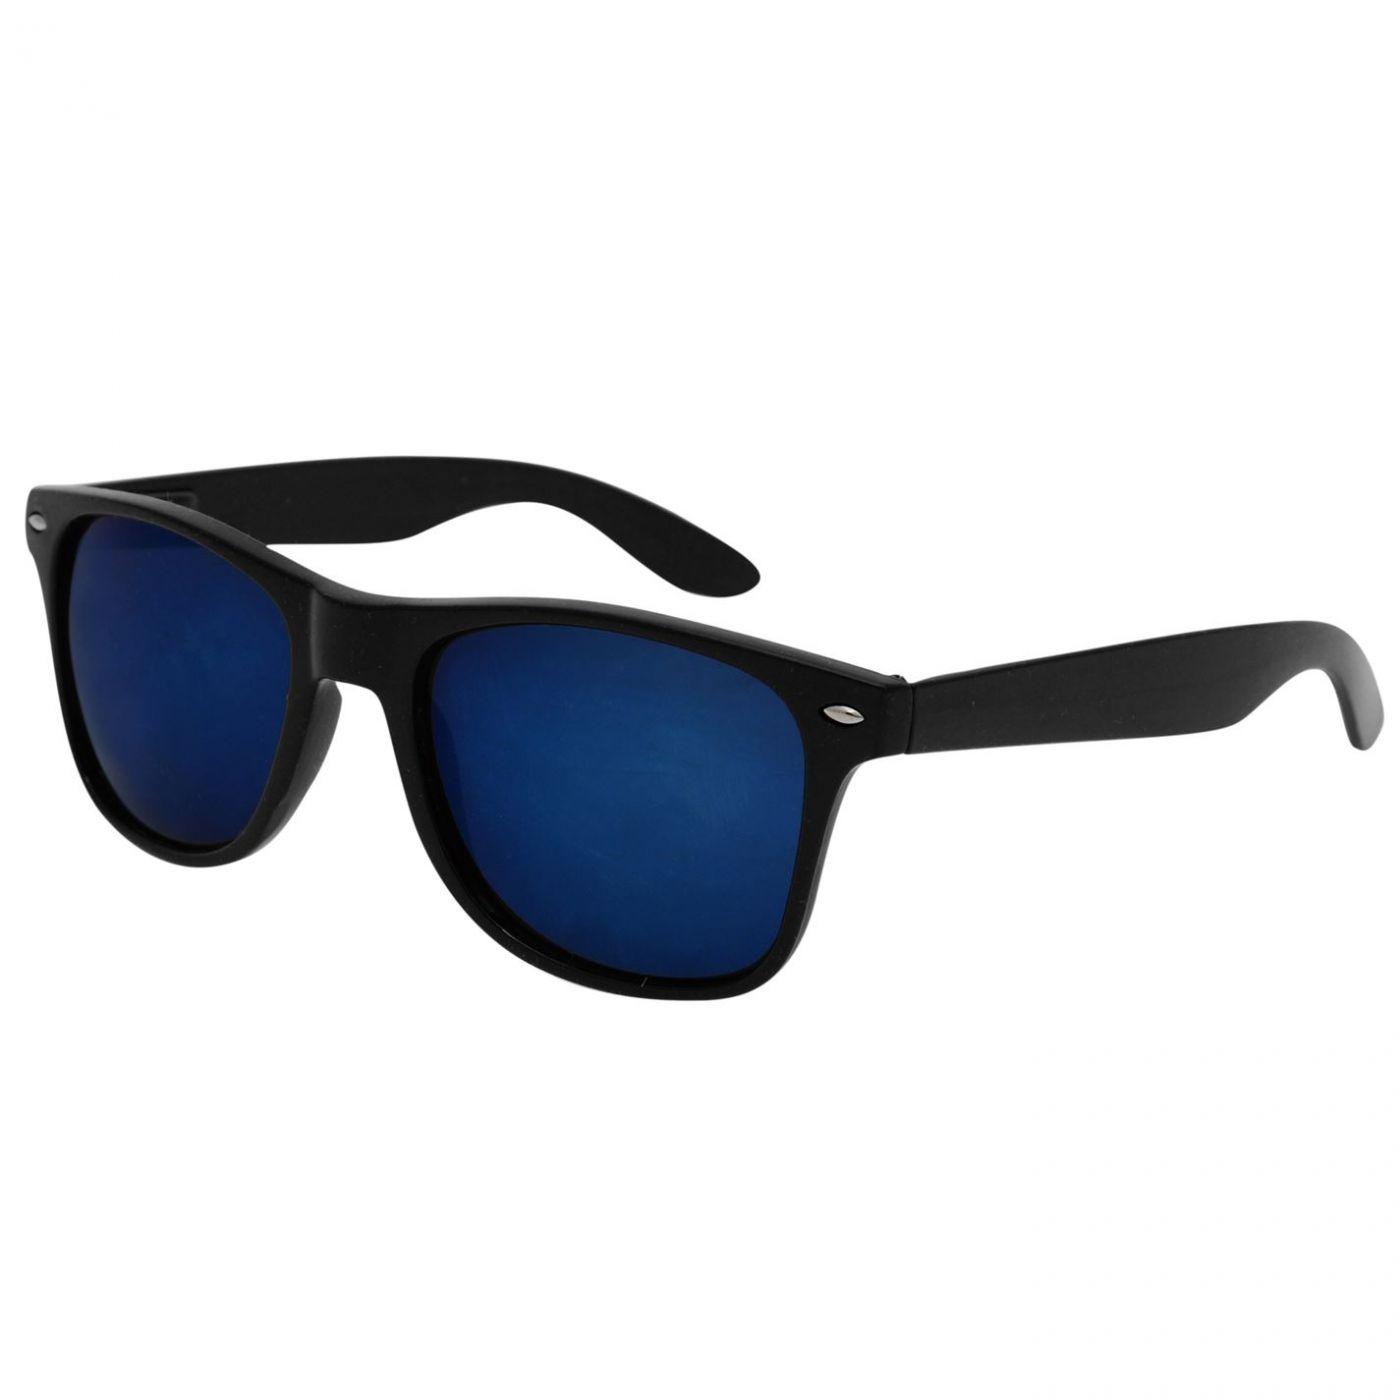 Pulp Iridescent Sunglasses Mens